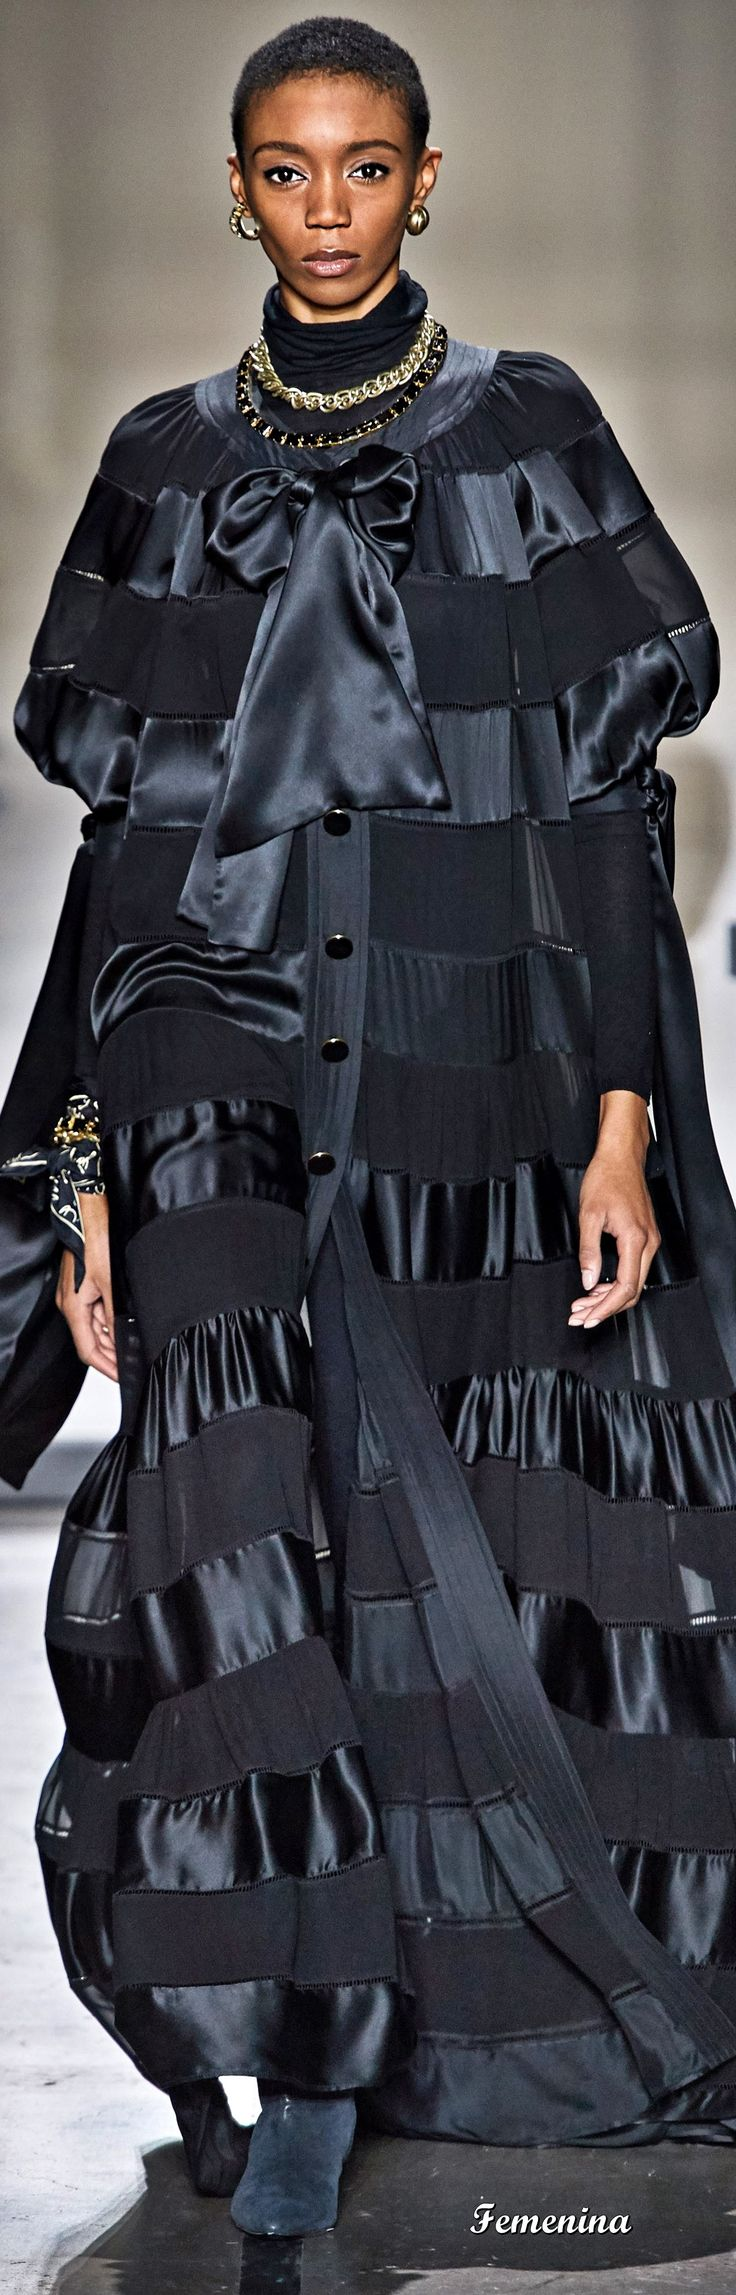 zimmermann fall winter 2019 20 rtw fashion fall winter luxury